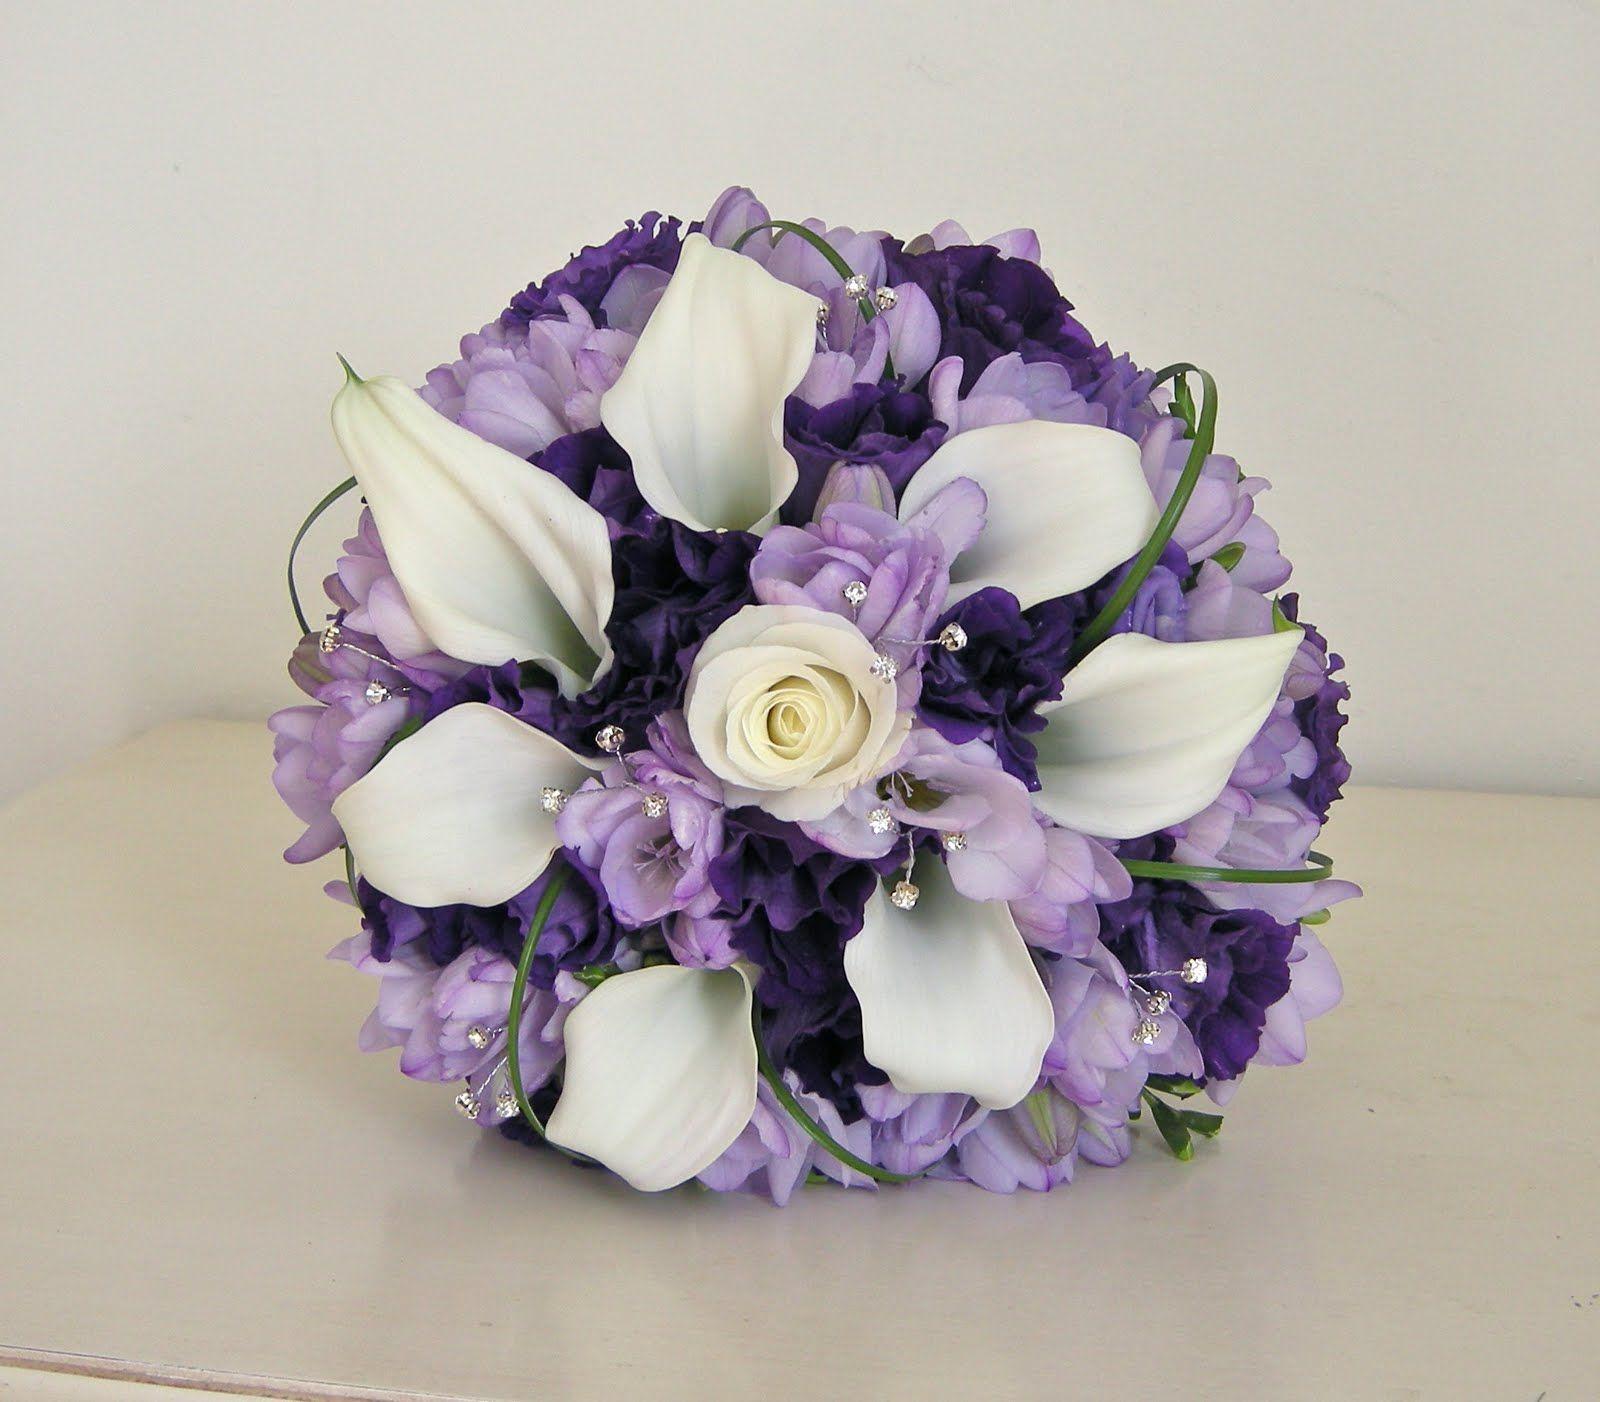 Lavender roses purple lisianthus and white alstromeria Bing